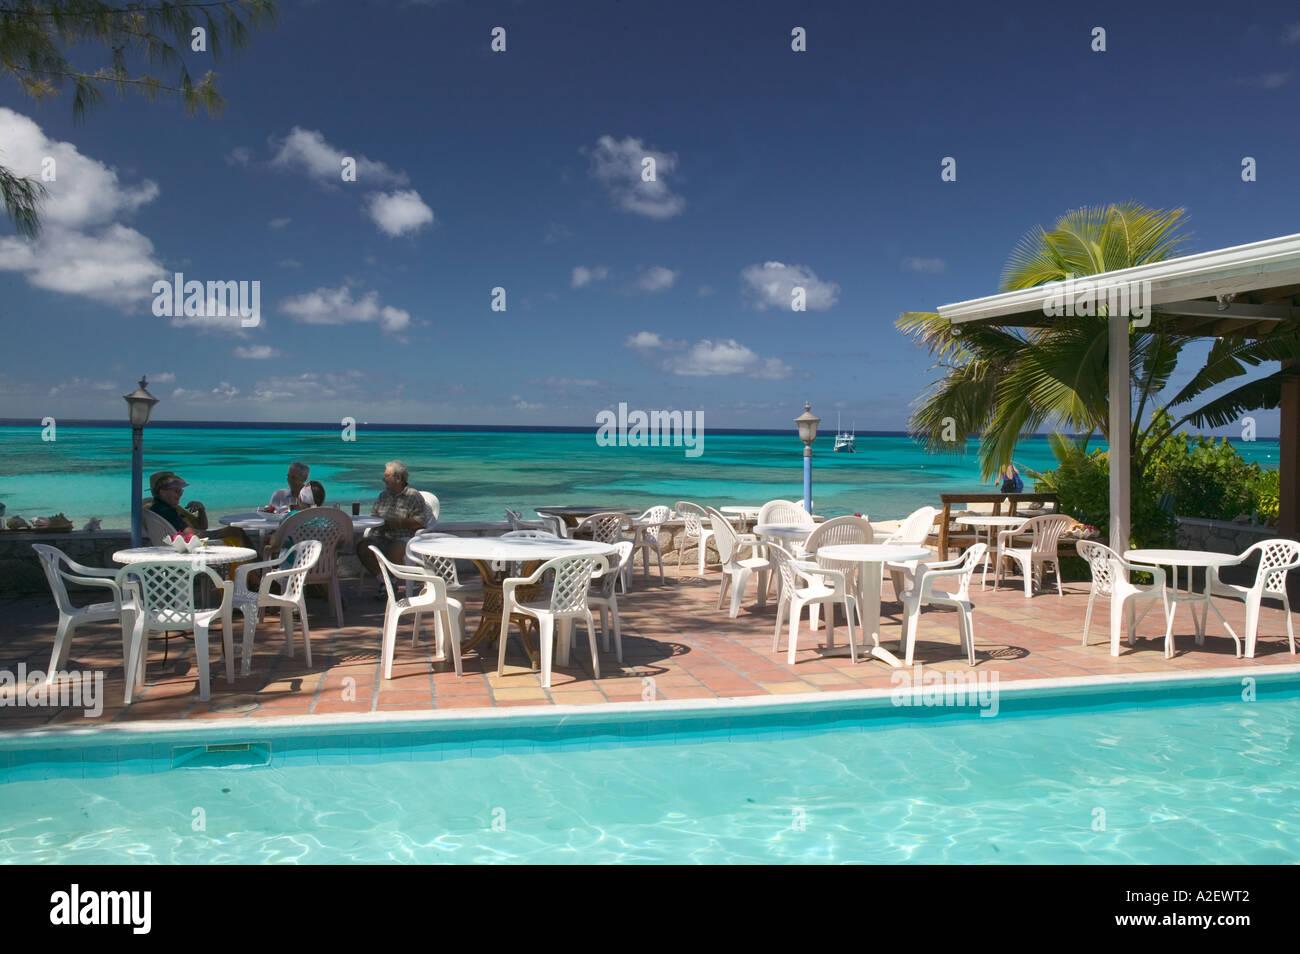 Caribbean weddings grand turk - Caribbean Turks Caicos Grand Turk Island Cockburn Town Osprey Beach Hotel Pool View